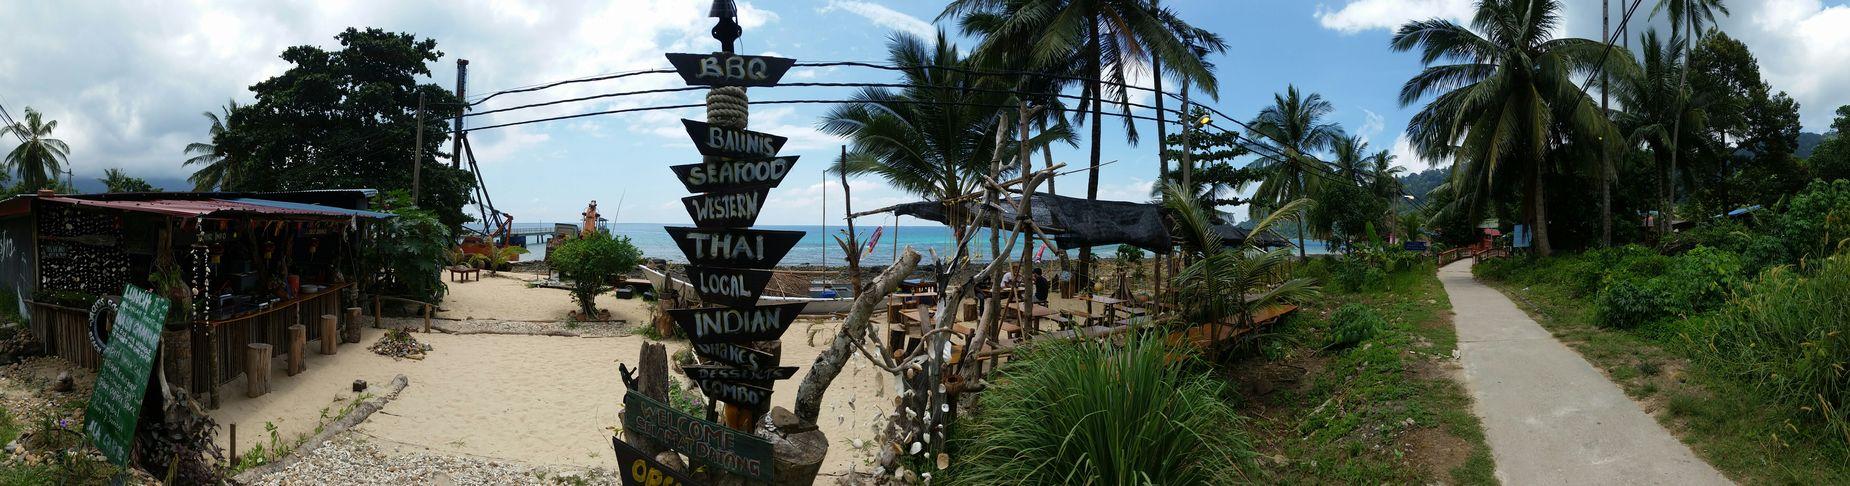 Tioman Tiomanisland Malaysia Travelling Enjoying Life Hello World Relax Diving Photooftheday Backpacking